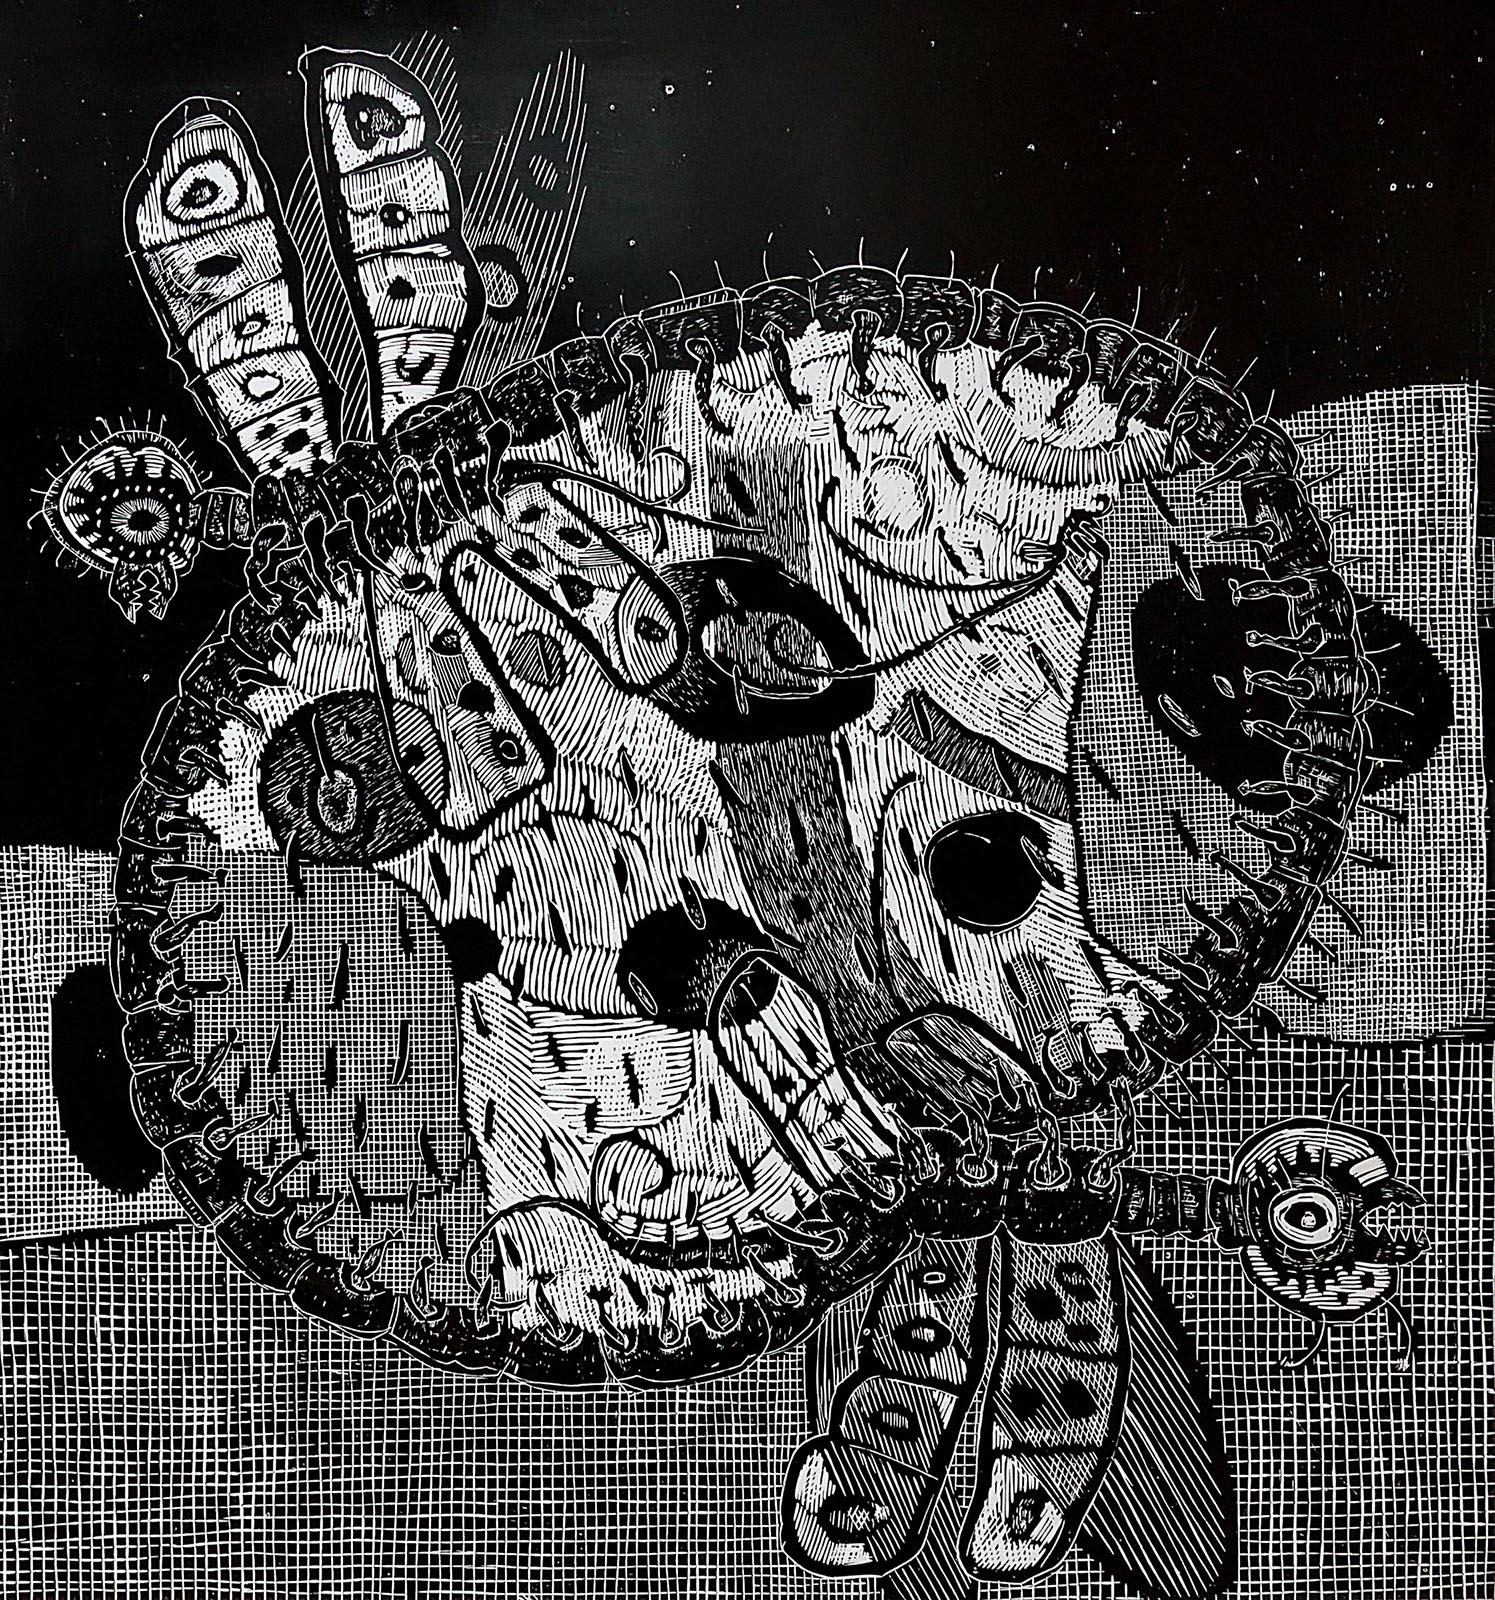 Фото №203617. ТЕРЕГУЛОВ АЙРАТ РАУФОВИЧ. 1957 Россия, Башкортостан, Уфа ANIMALS-17. 2012 Бумага, линогравюра